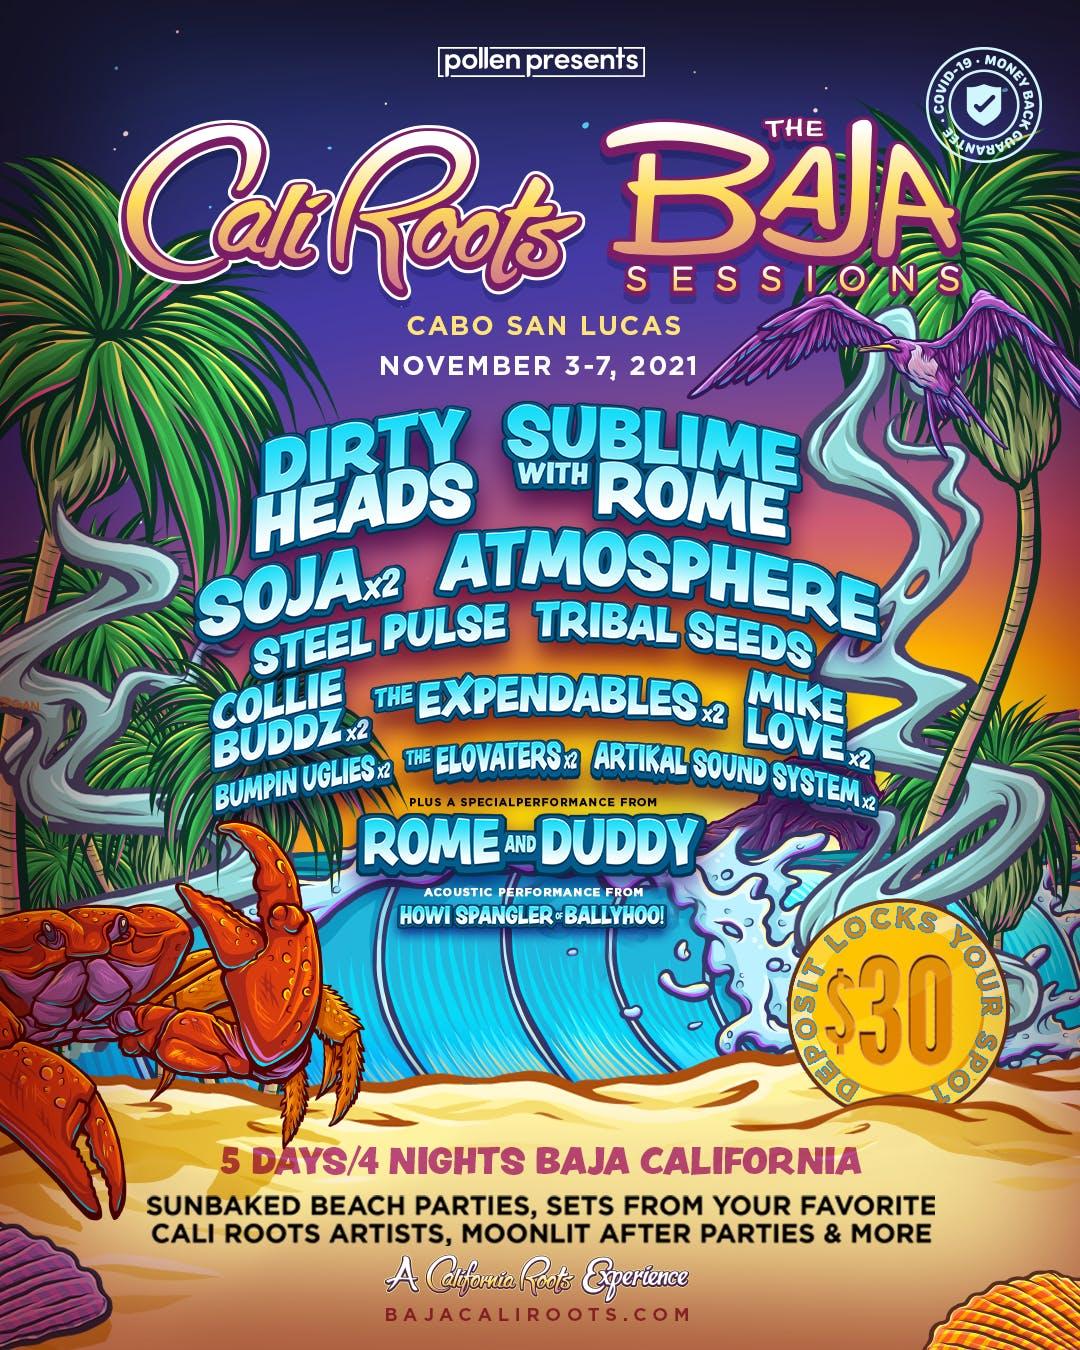 Cali Roots: The Baja Sessions Lineup